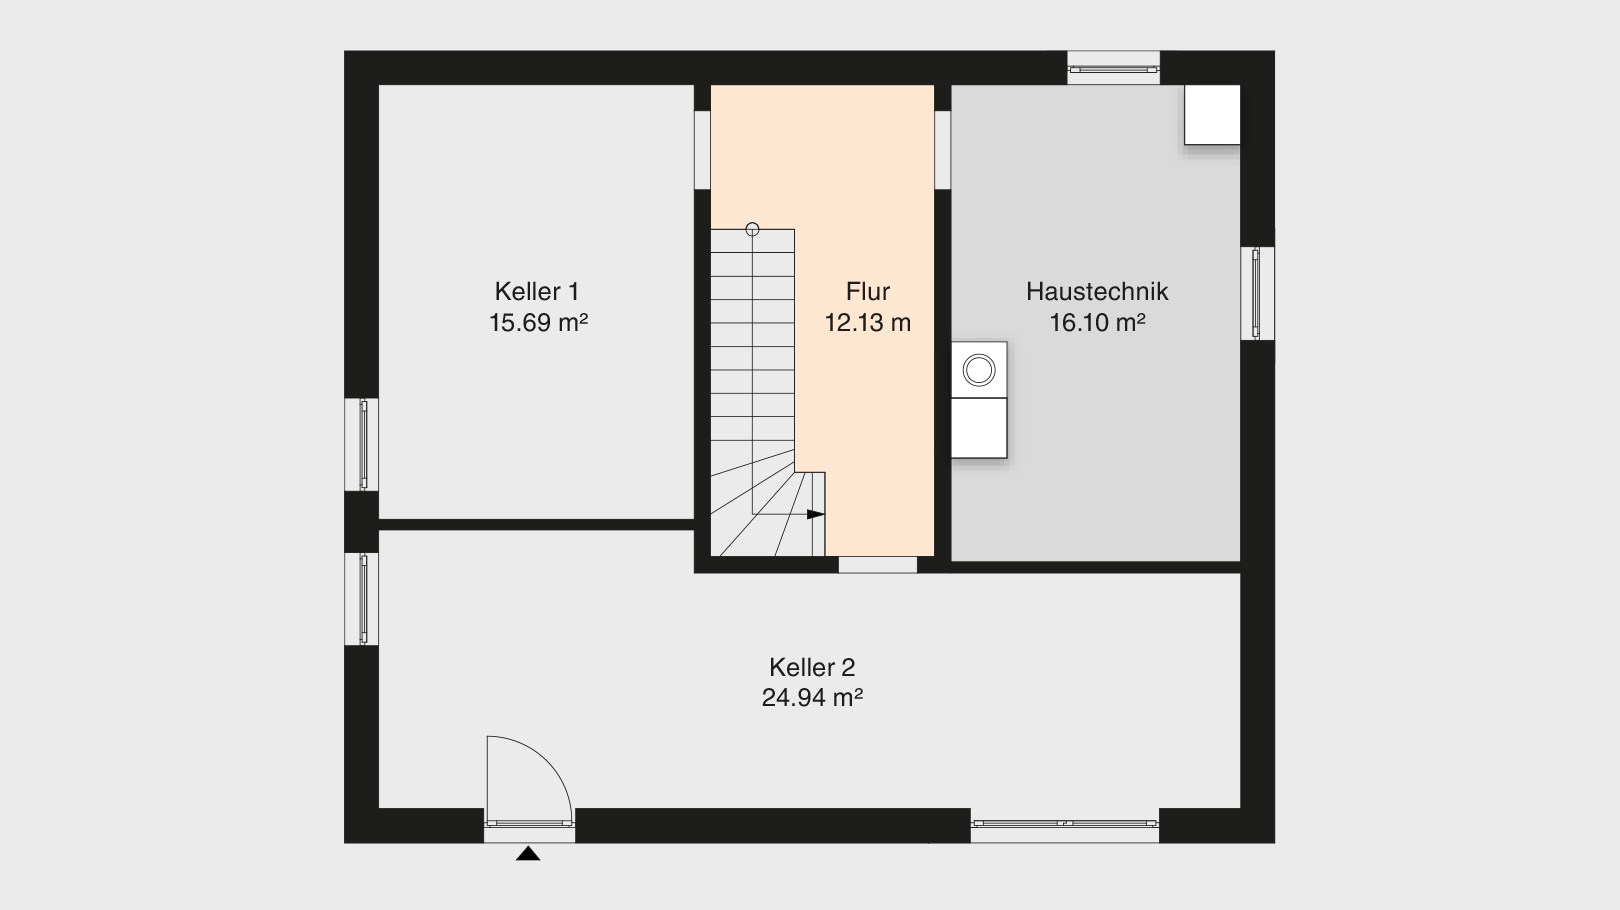 Haus-Idee-Bad Langensalza